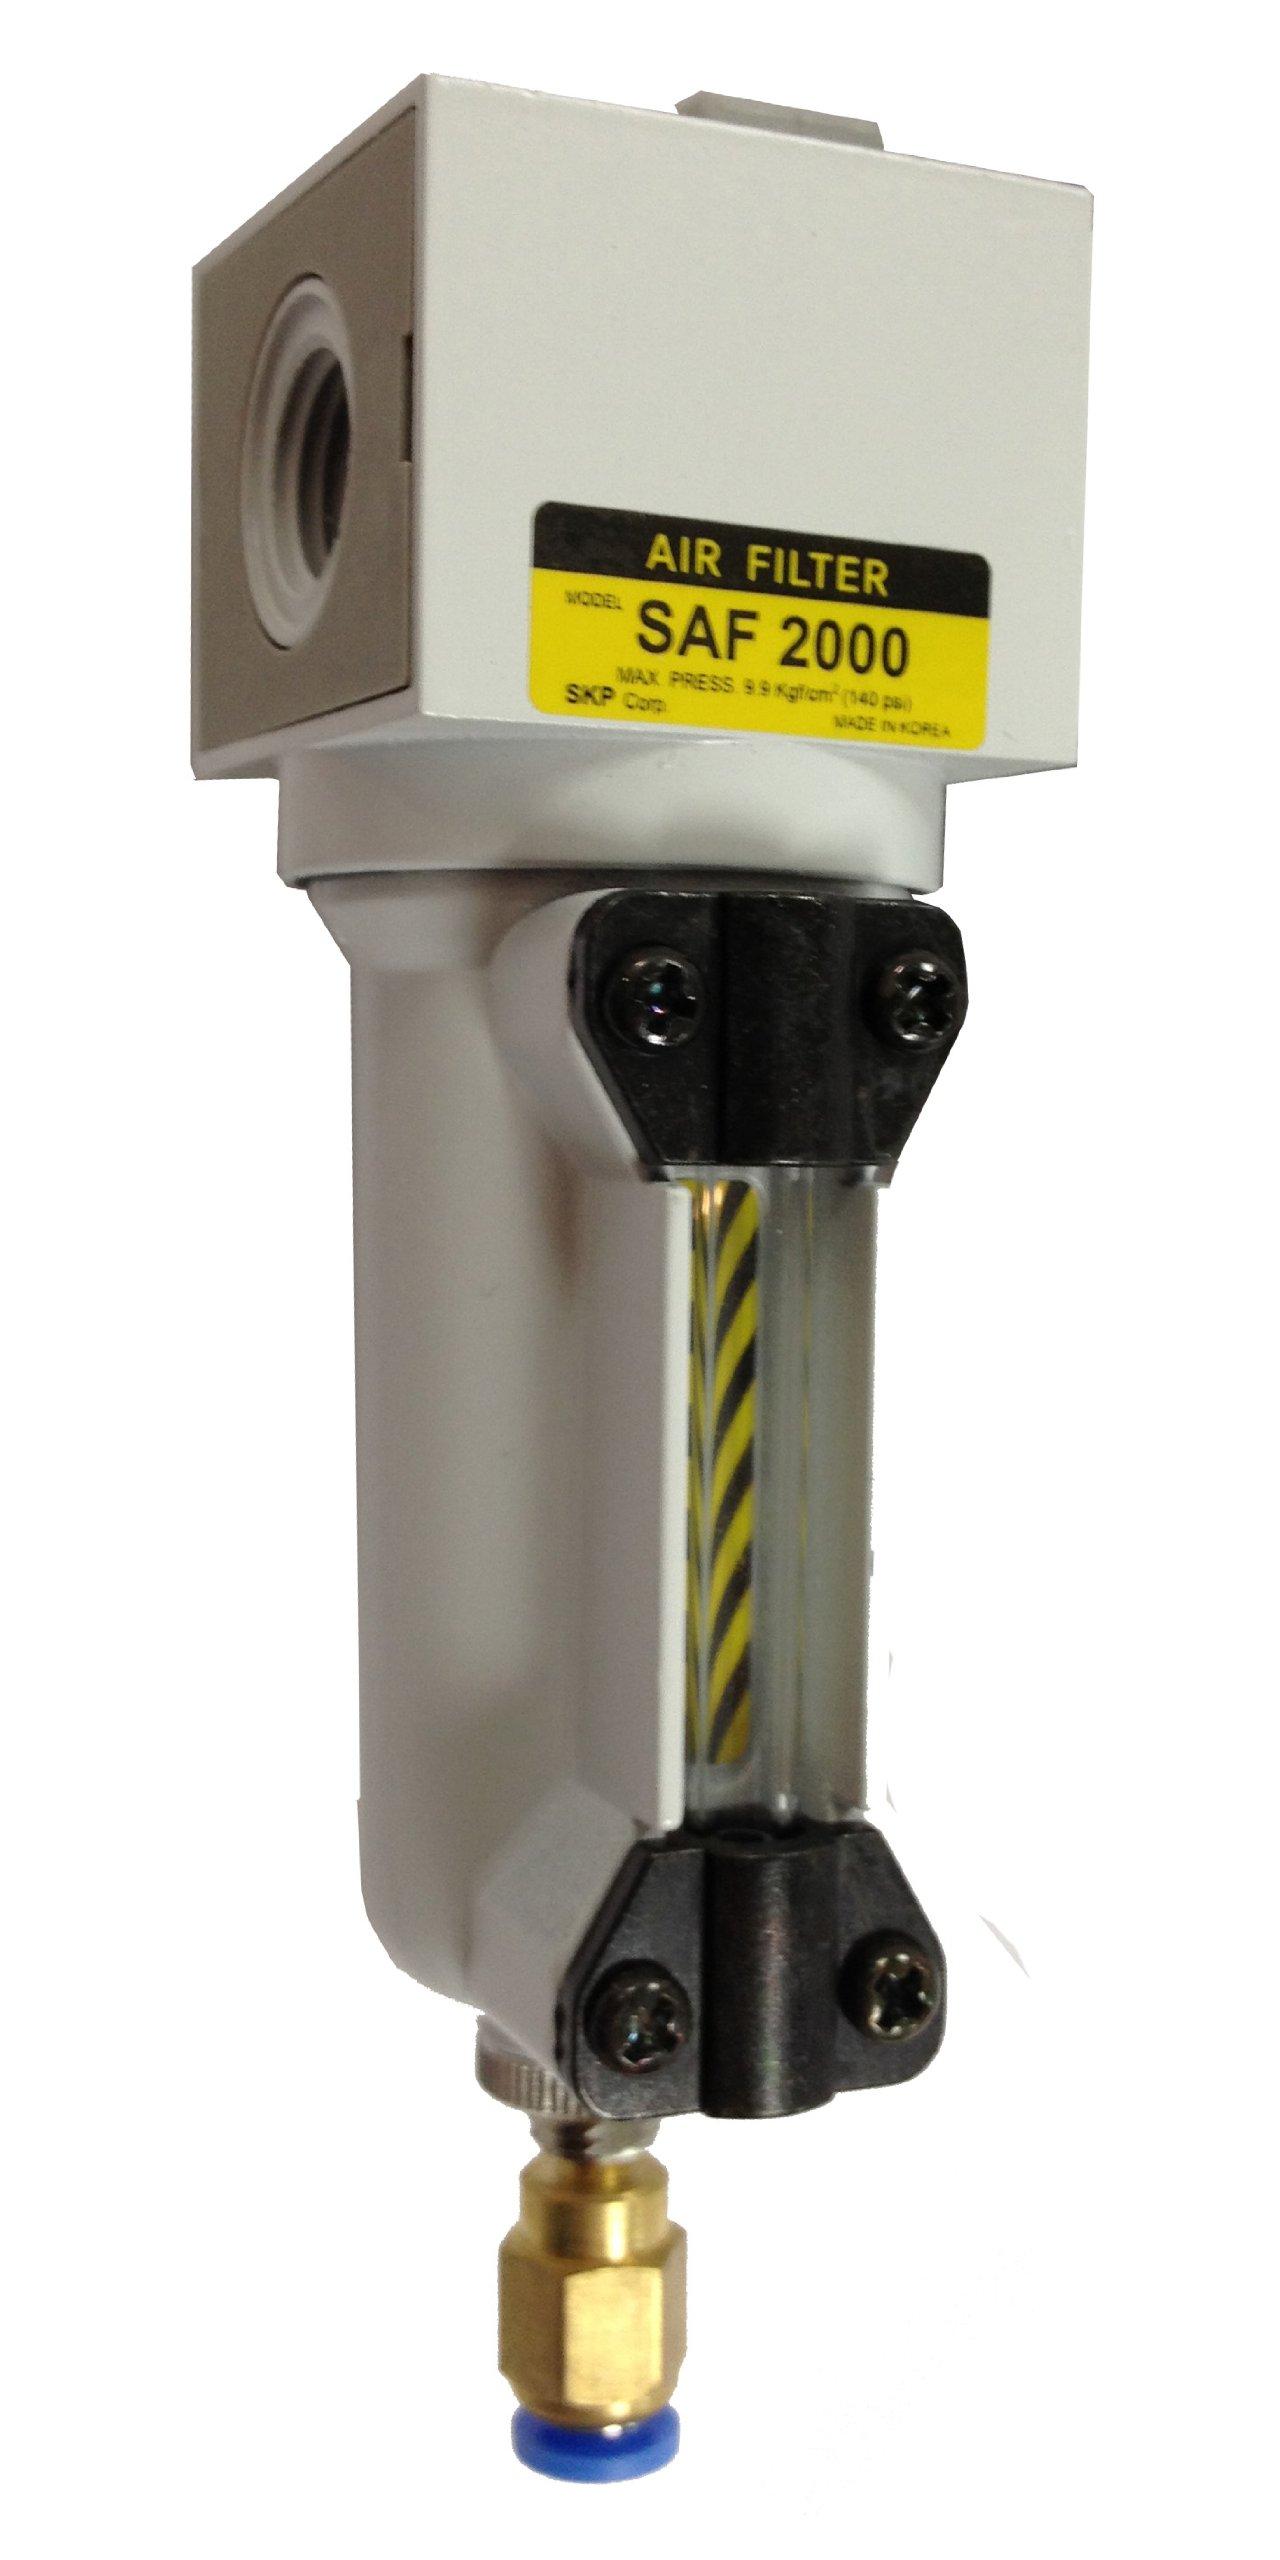 PneumaticPlus SAF2000M-N02BD-MEP Miniature Compressed Air Particulate Filter 1/4'' NPT - Metal Bowl, Auto Drain, Bracket by PneumaticPlus